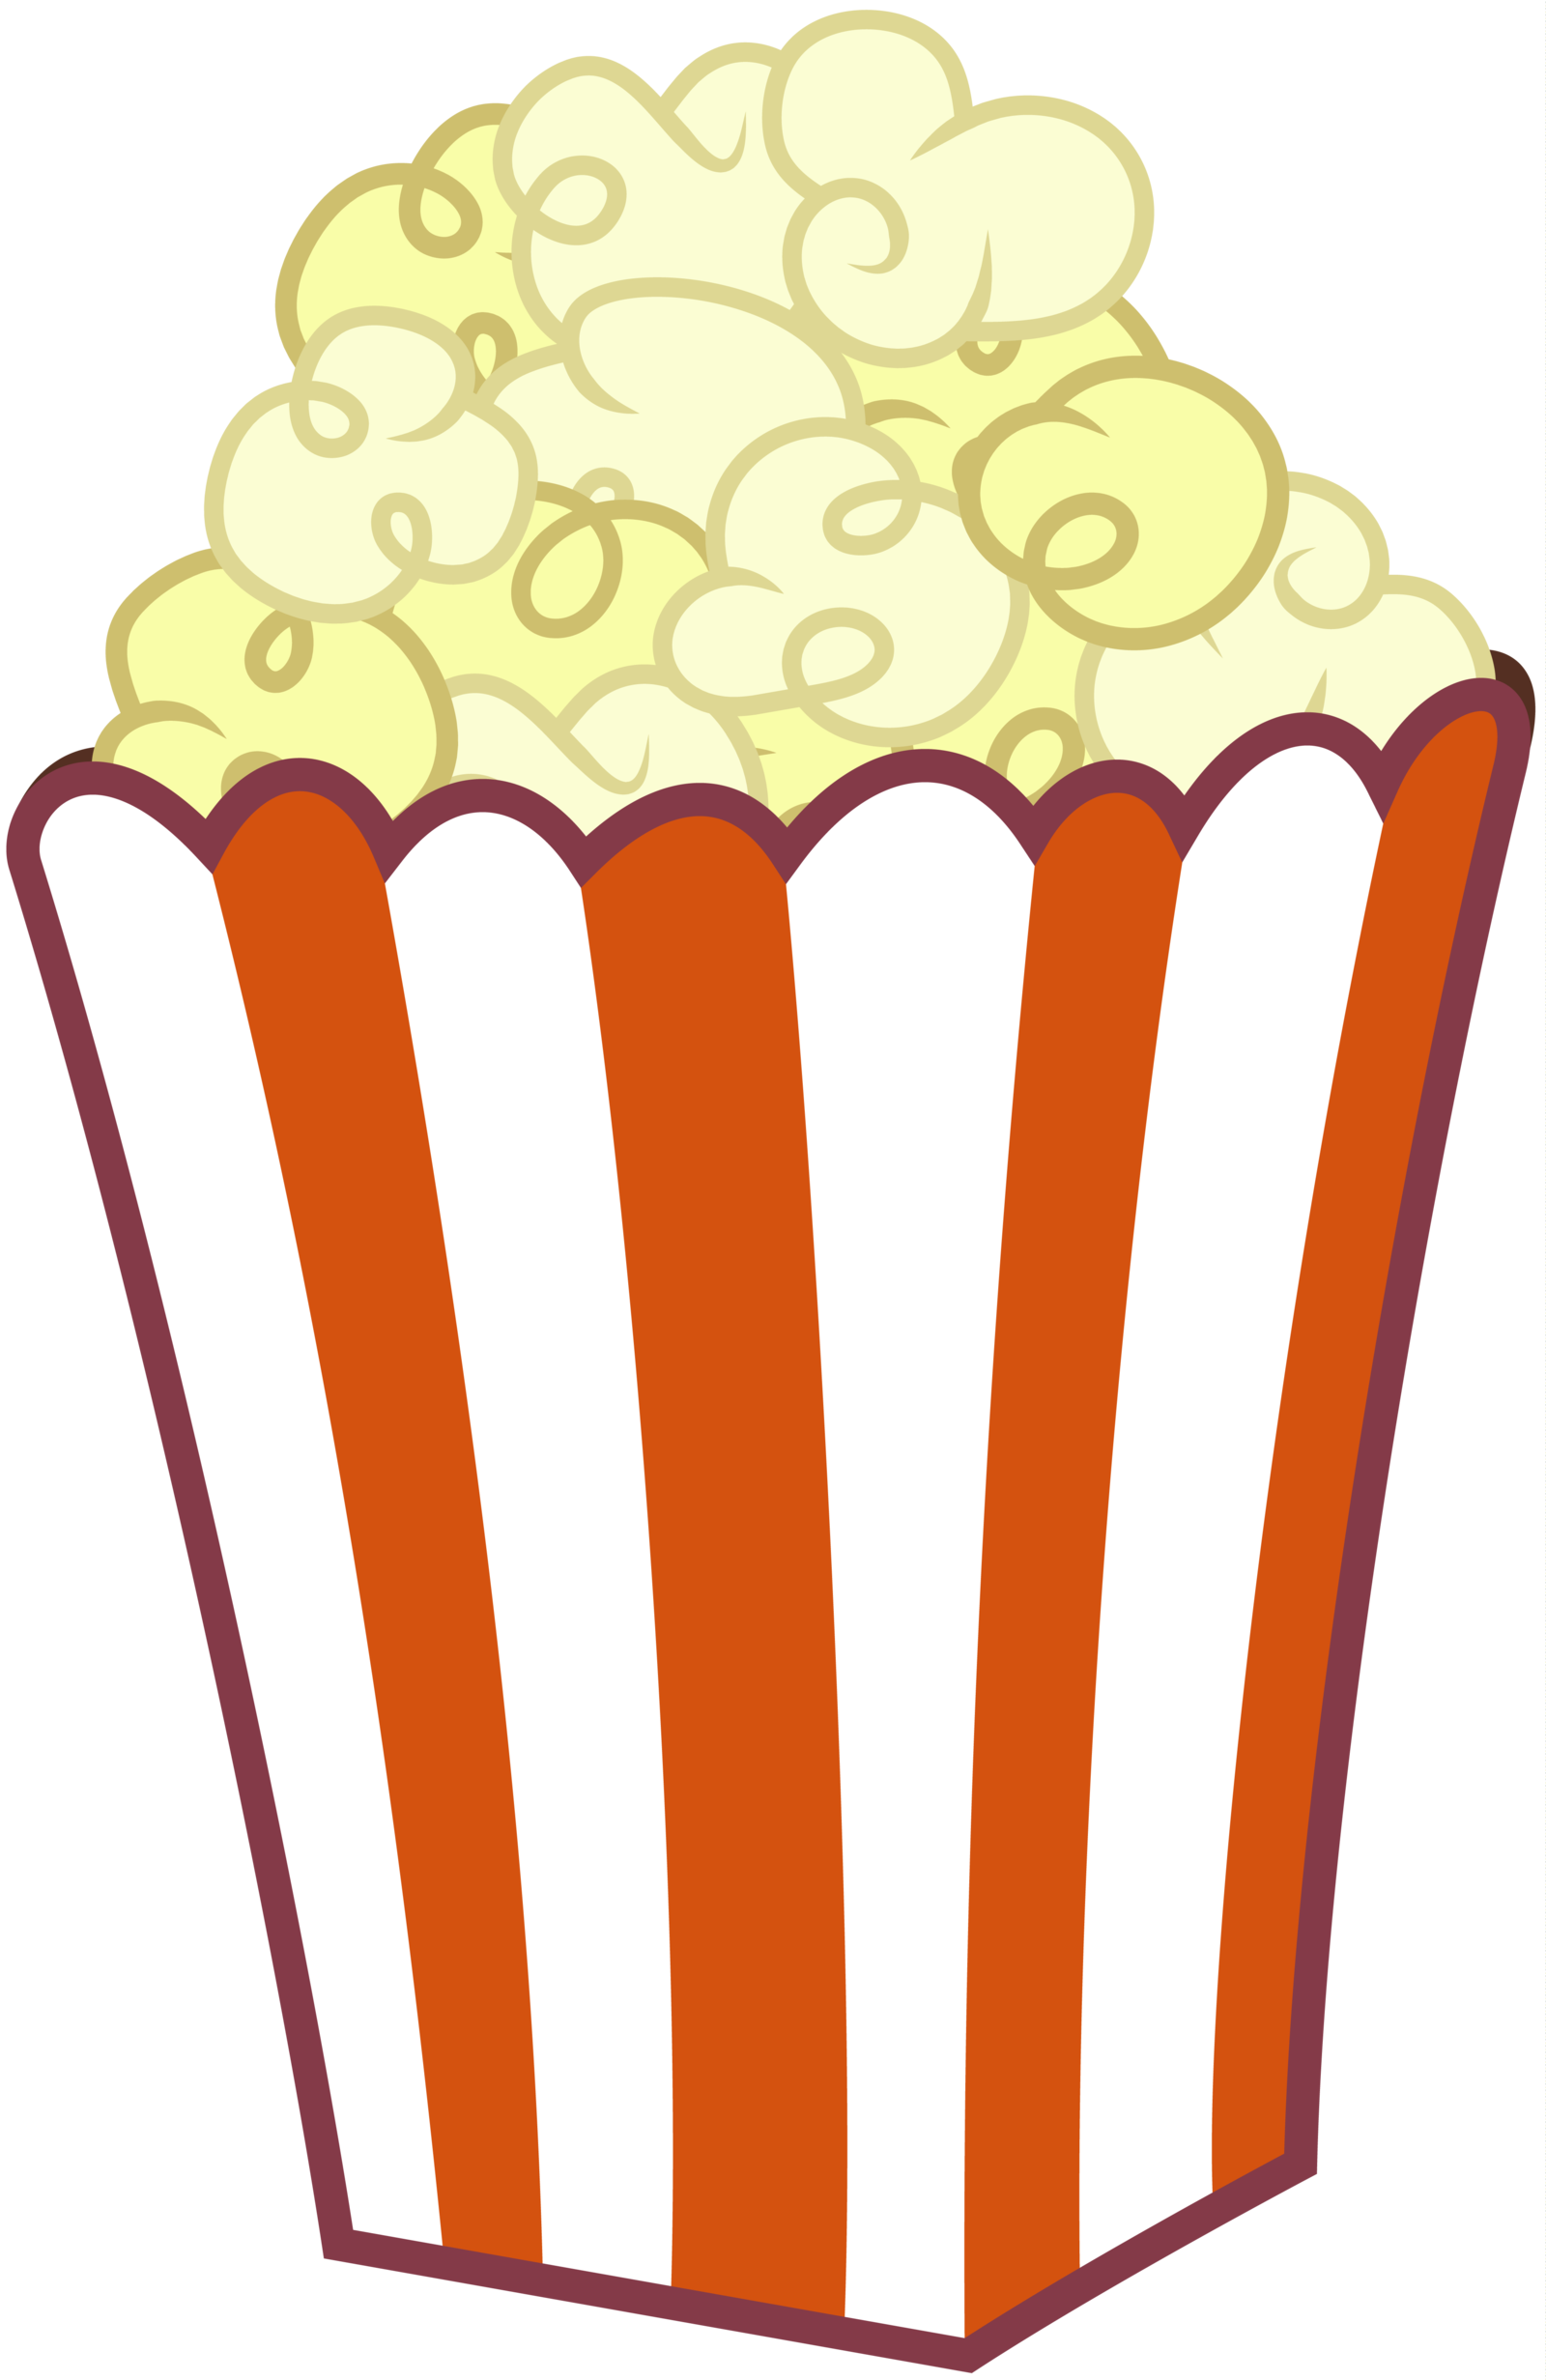 Mlp Resource Bag Of Popcorn By Lahirien -Mlp Resource Bag Of Popcorn By Lahirien Clipart Free Clip Art Images-4